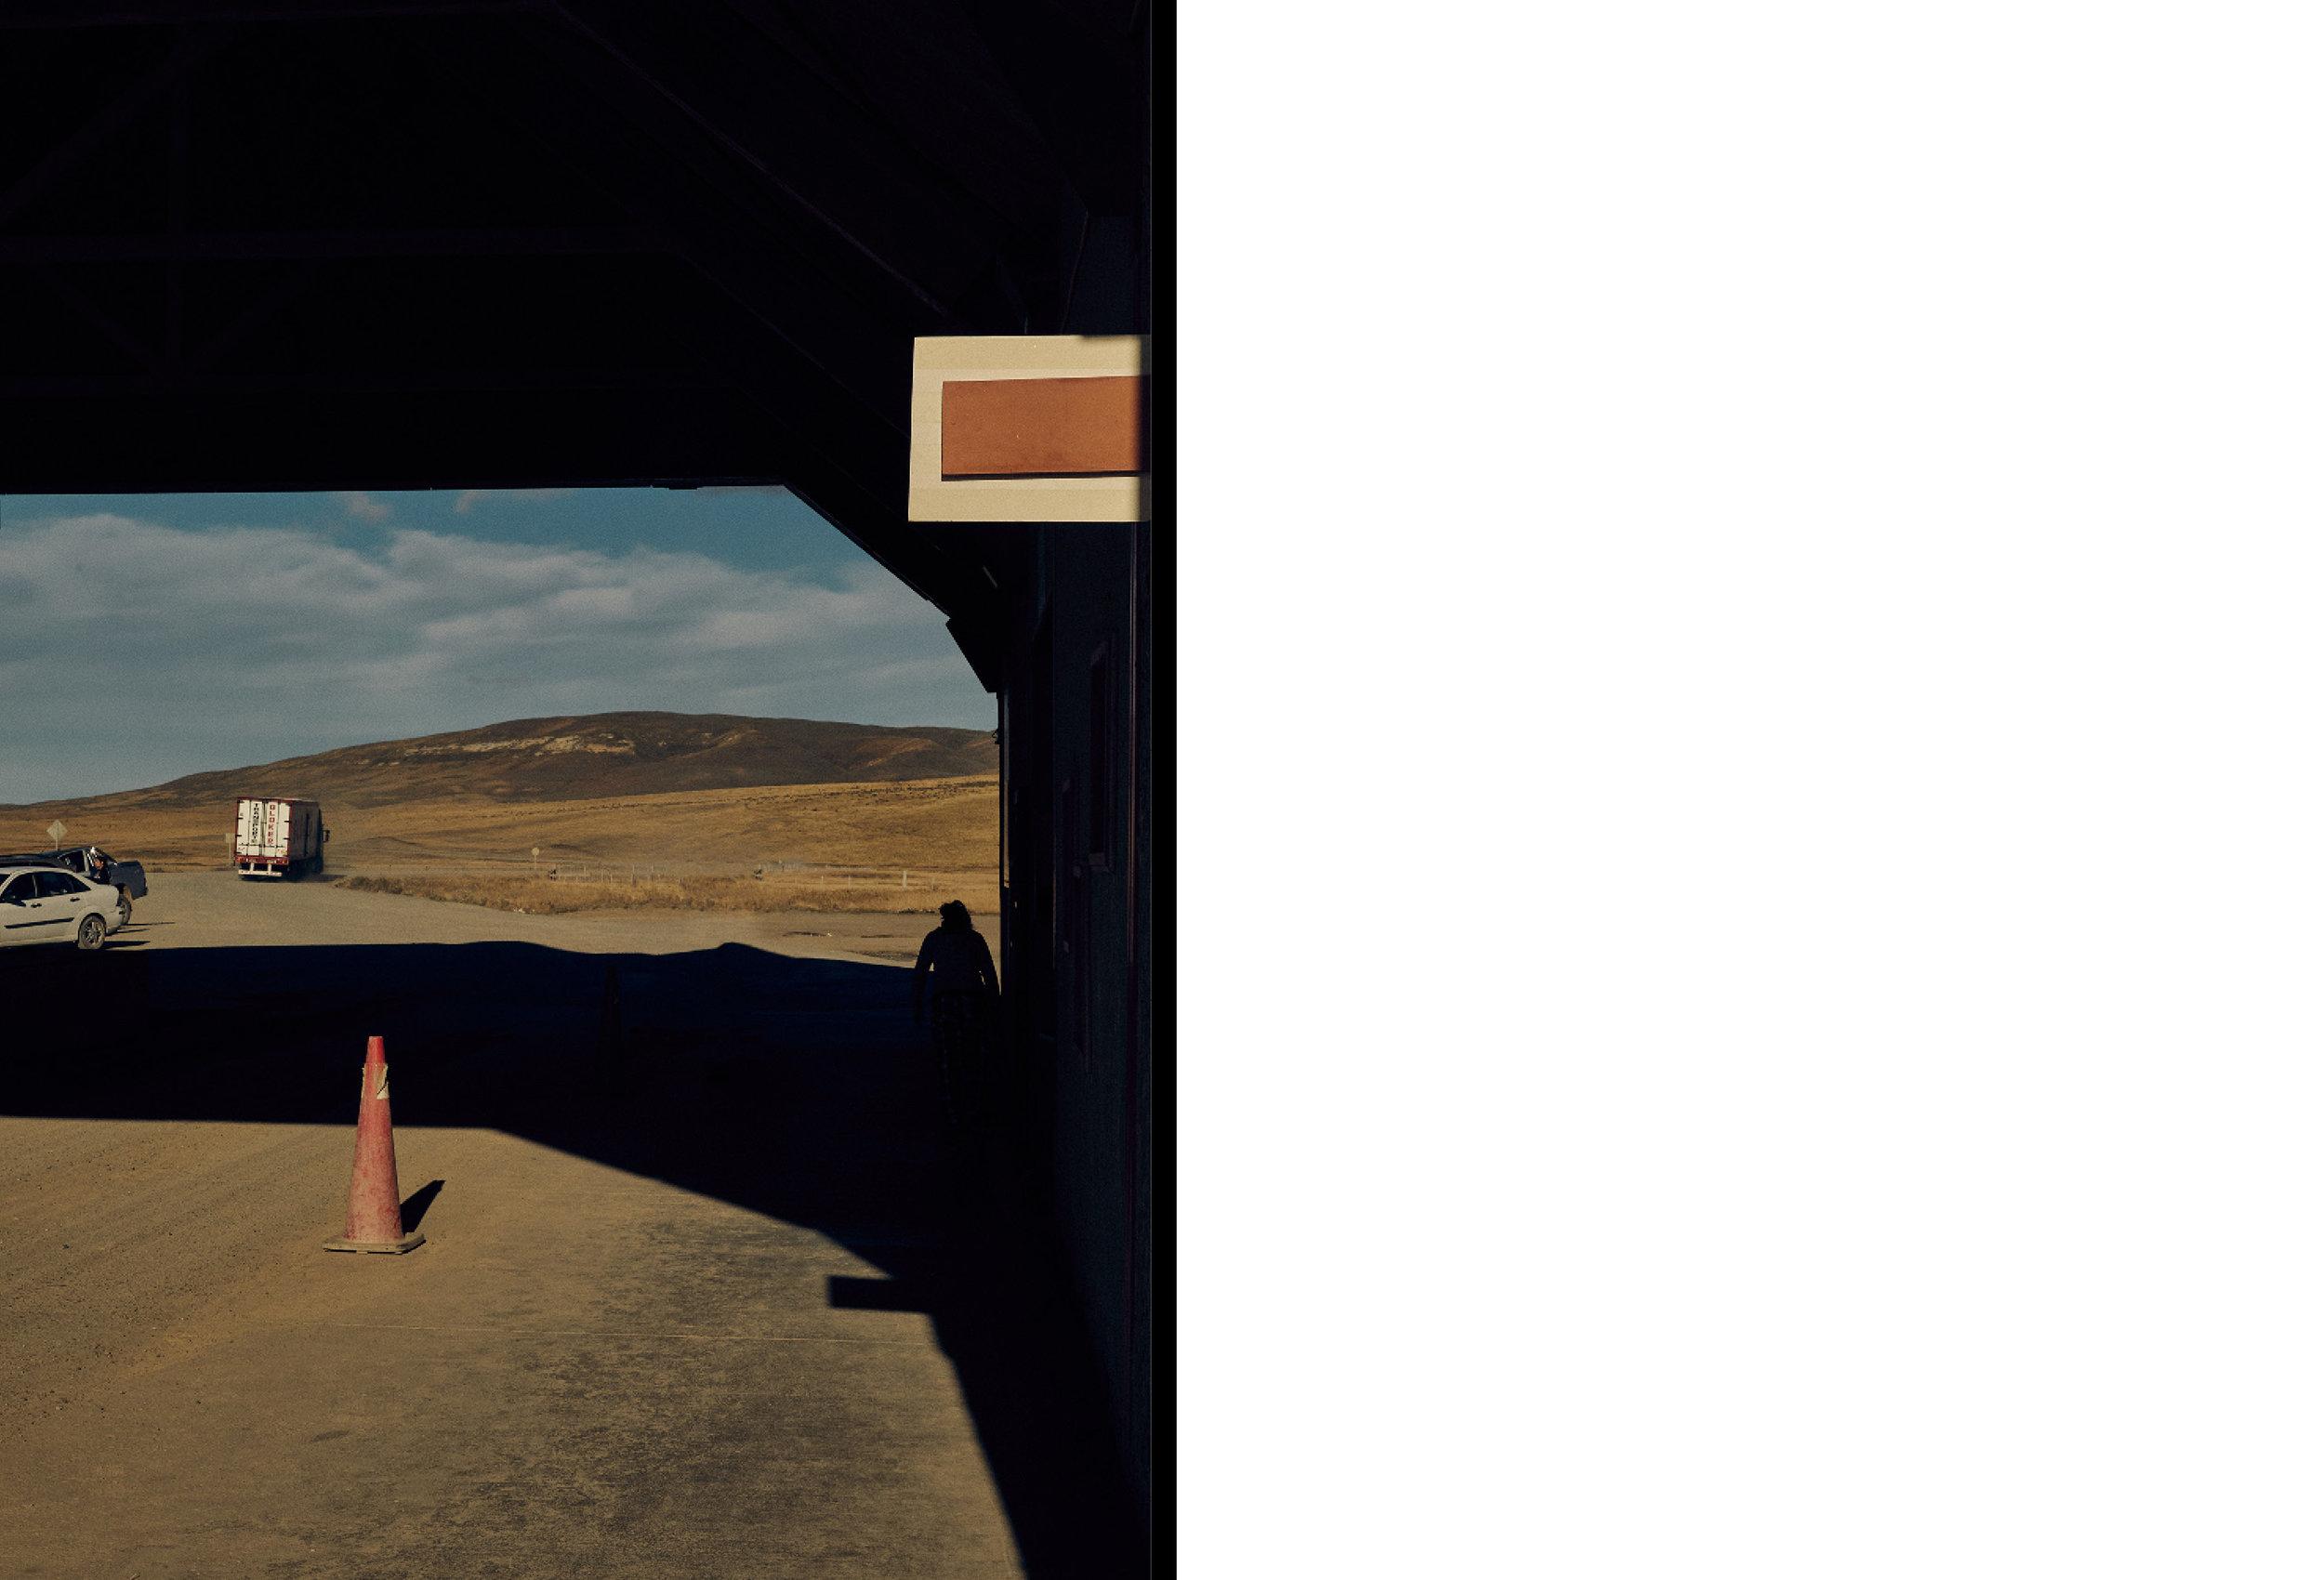 patagonia323210.jpg